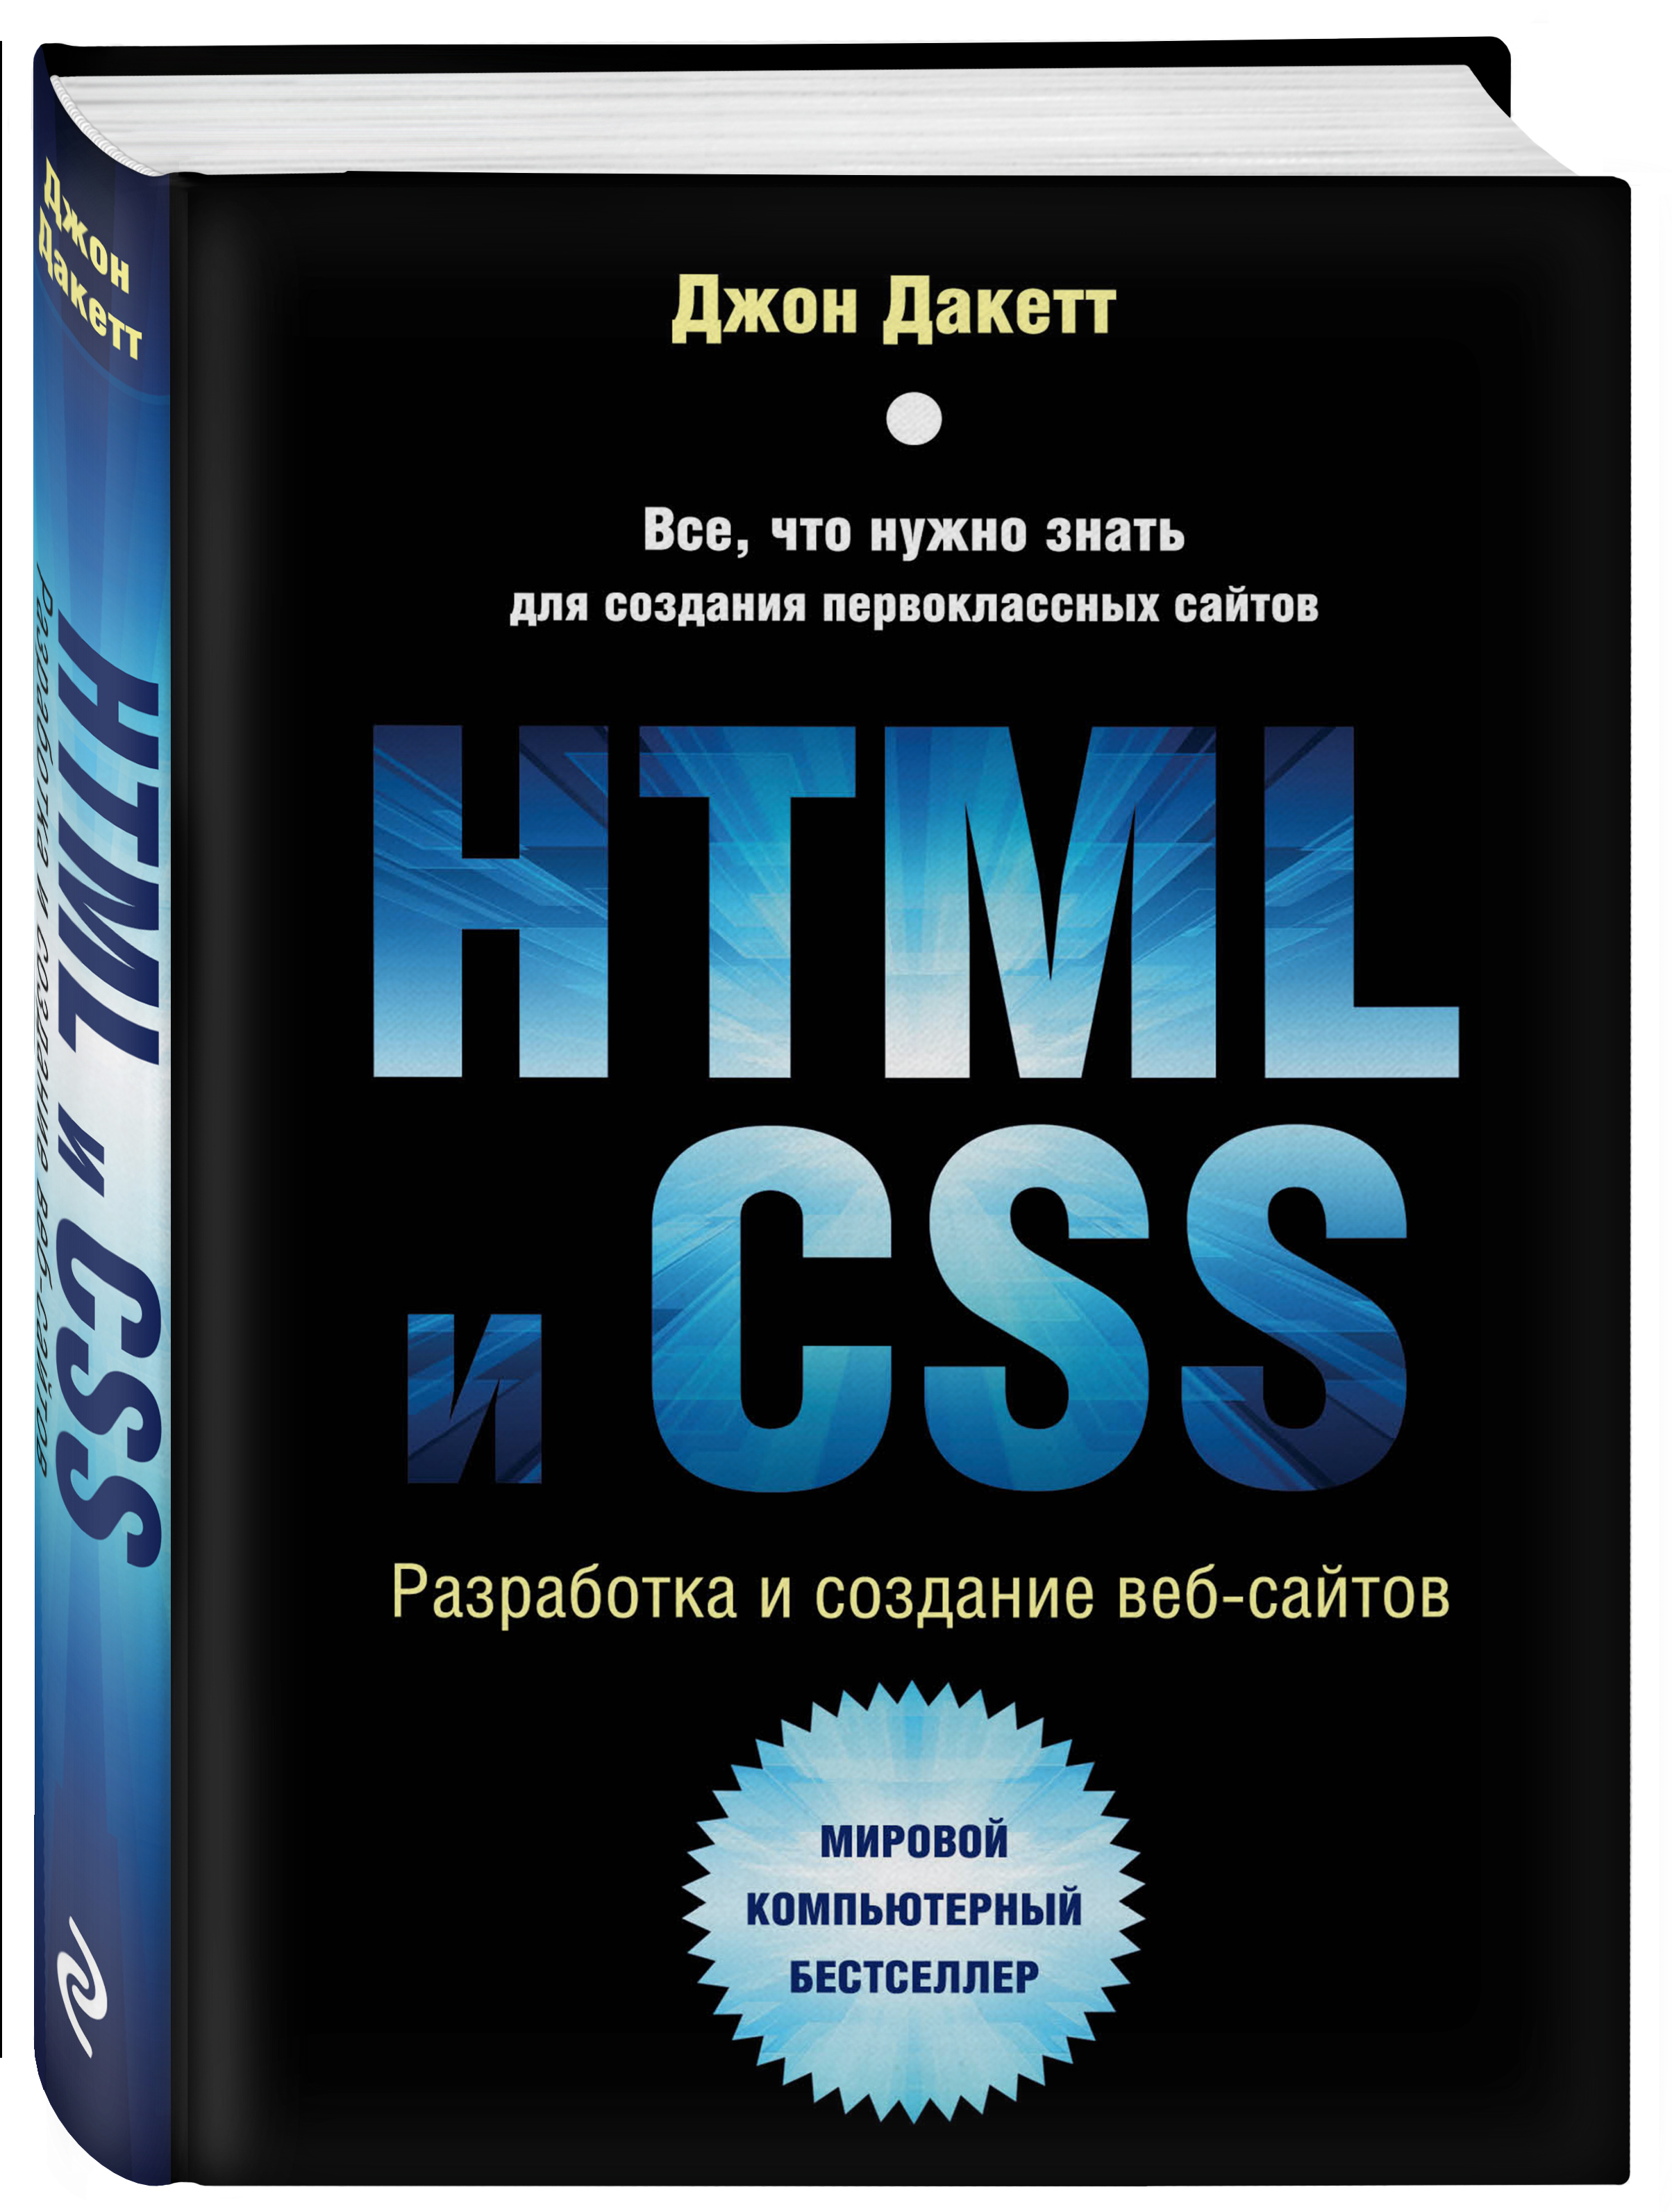 Джон Дакетт HTML и CSS. Разработка и дизайн веб-сайтов дакетт д html и css разработка и дизайн веб сайтов